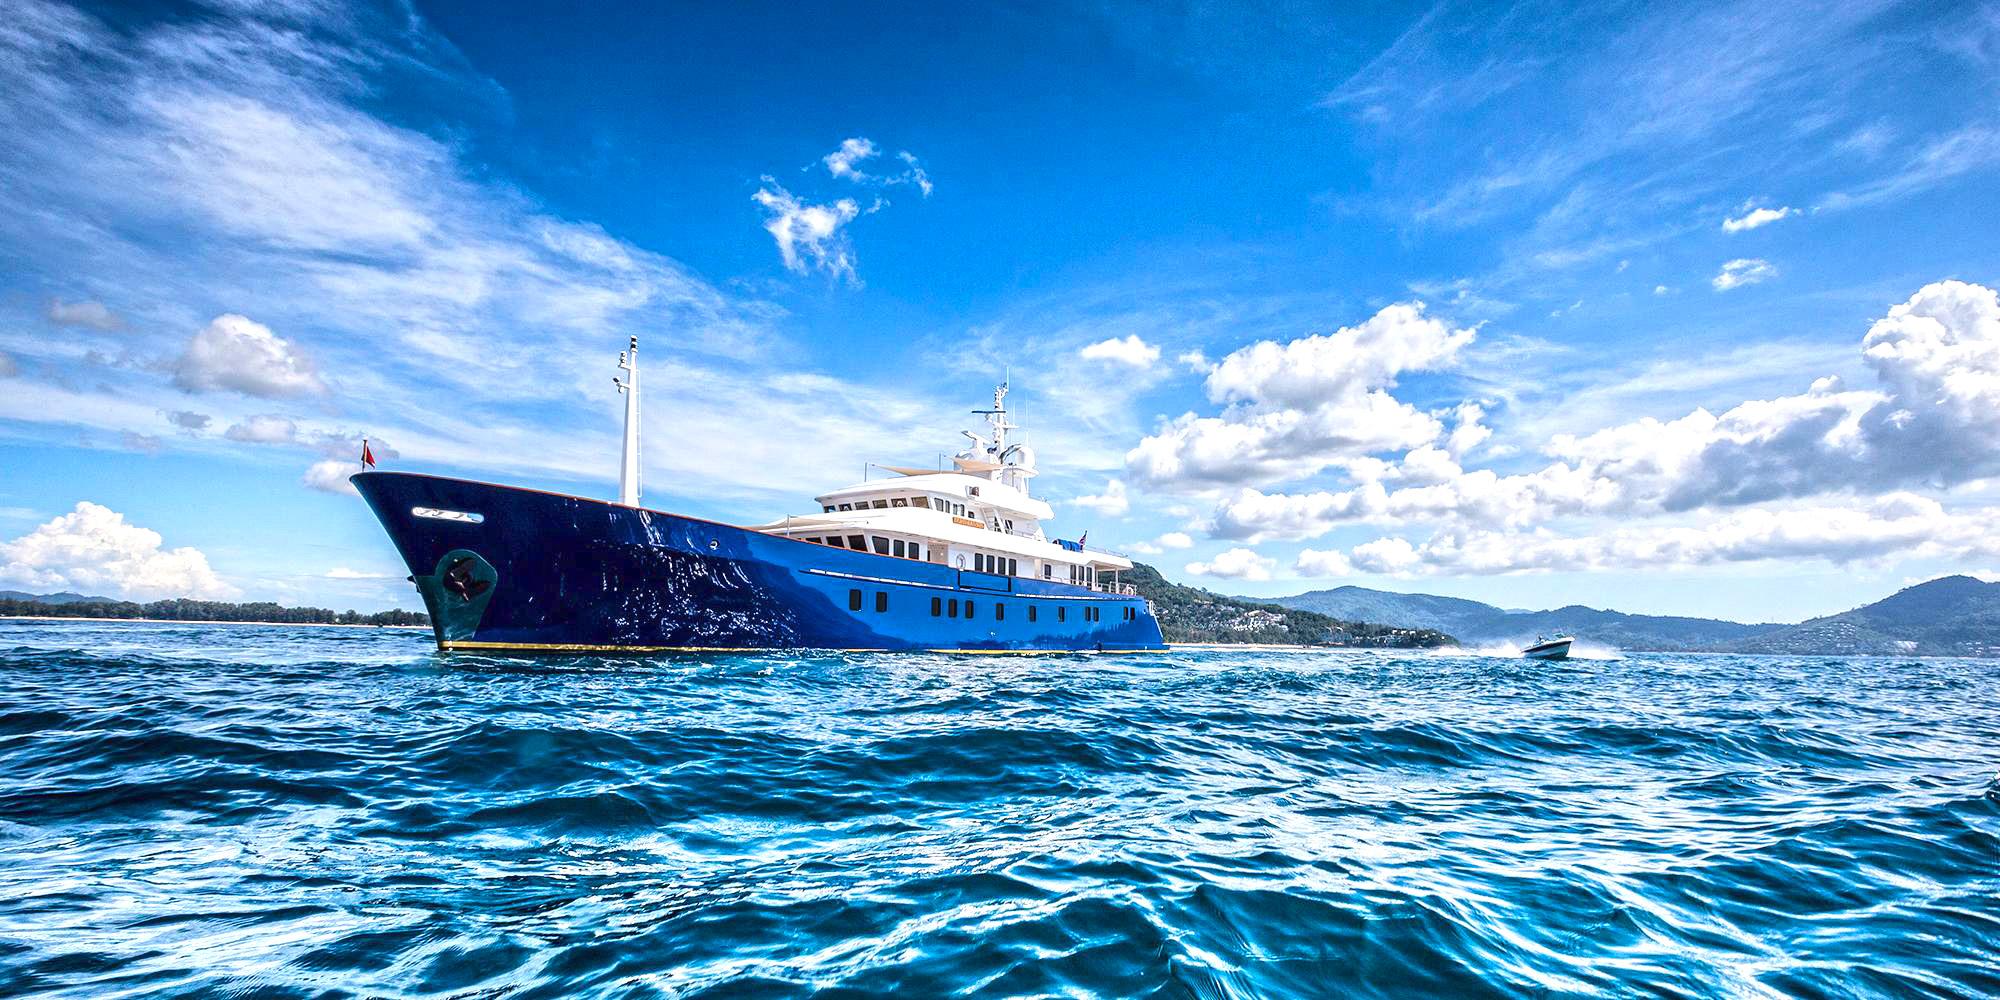 To buy Northern Sun - Narasaki Zosen Yacht